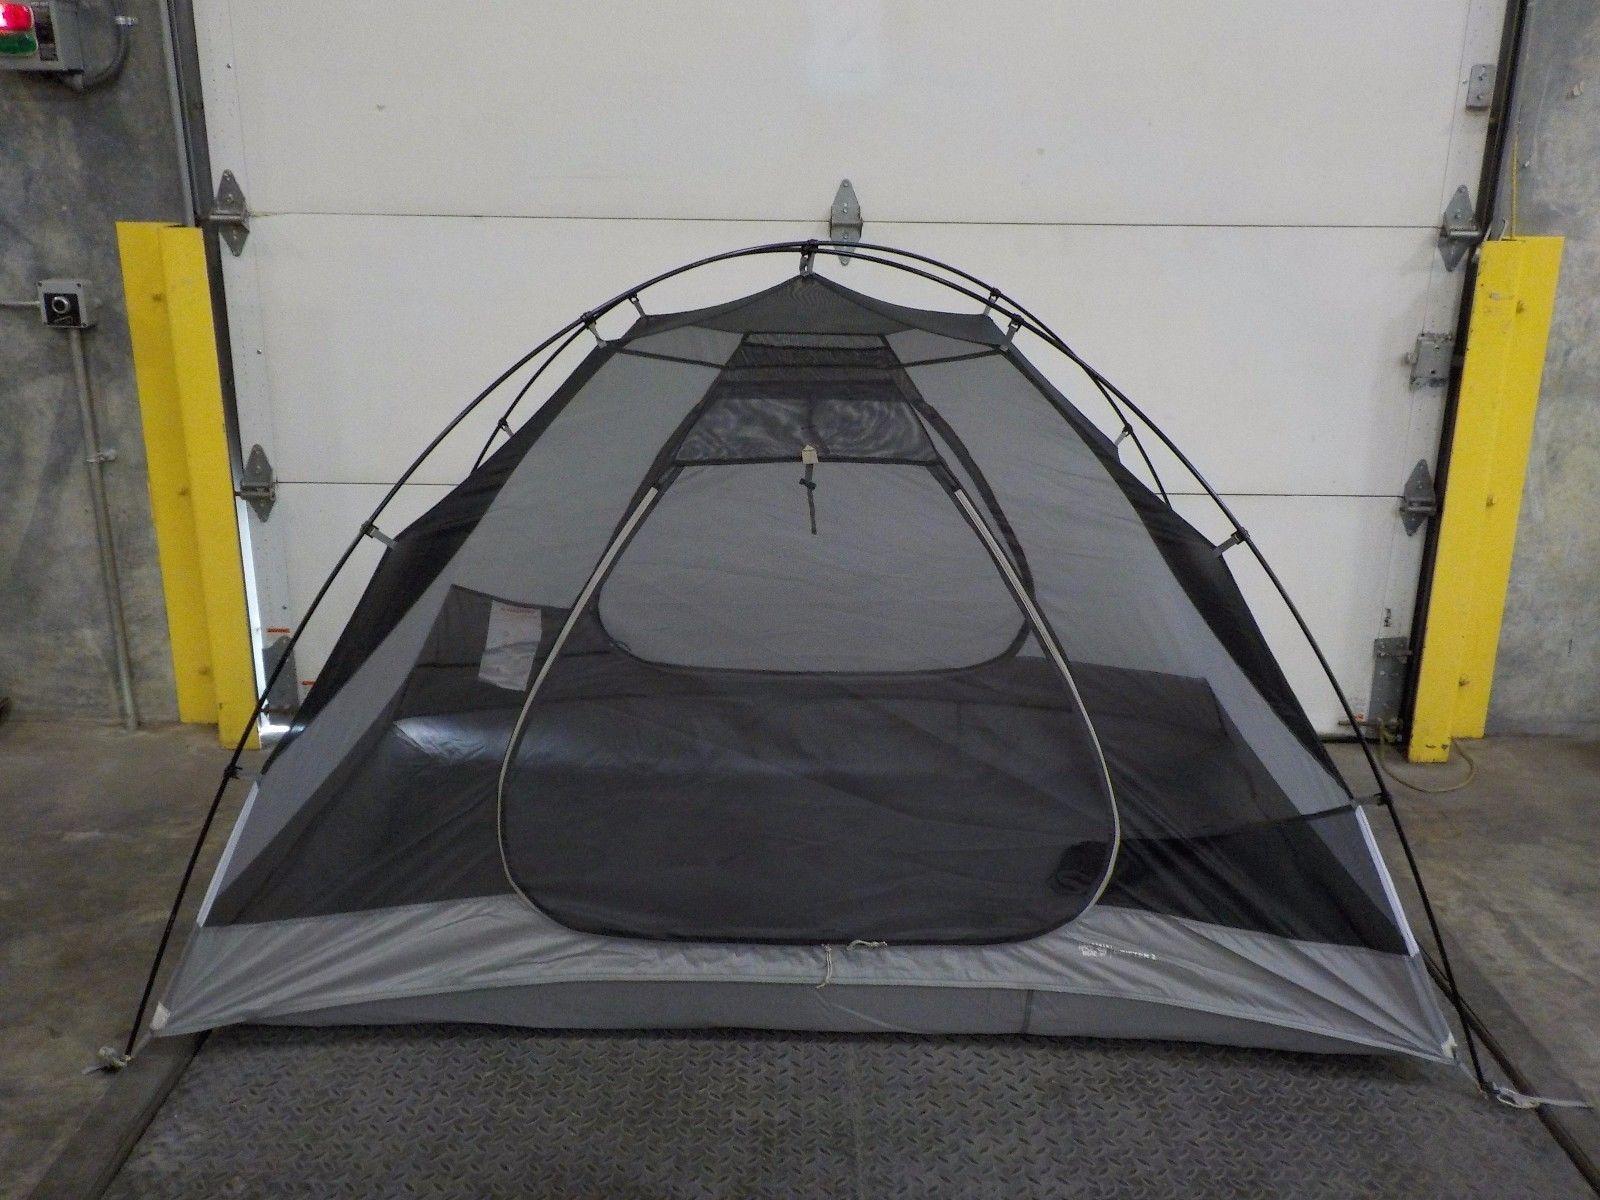 Mountain Hardwear Drifter 2 Lightweight Tent 2-Person 3-Season /35013/ & Mountain Hardwear Drifter 2 Lightweight Tent: 2-Person 3-Season ...